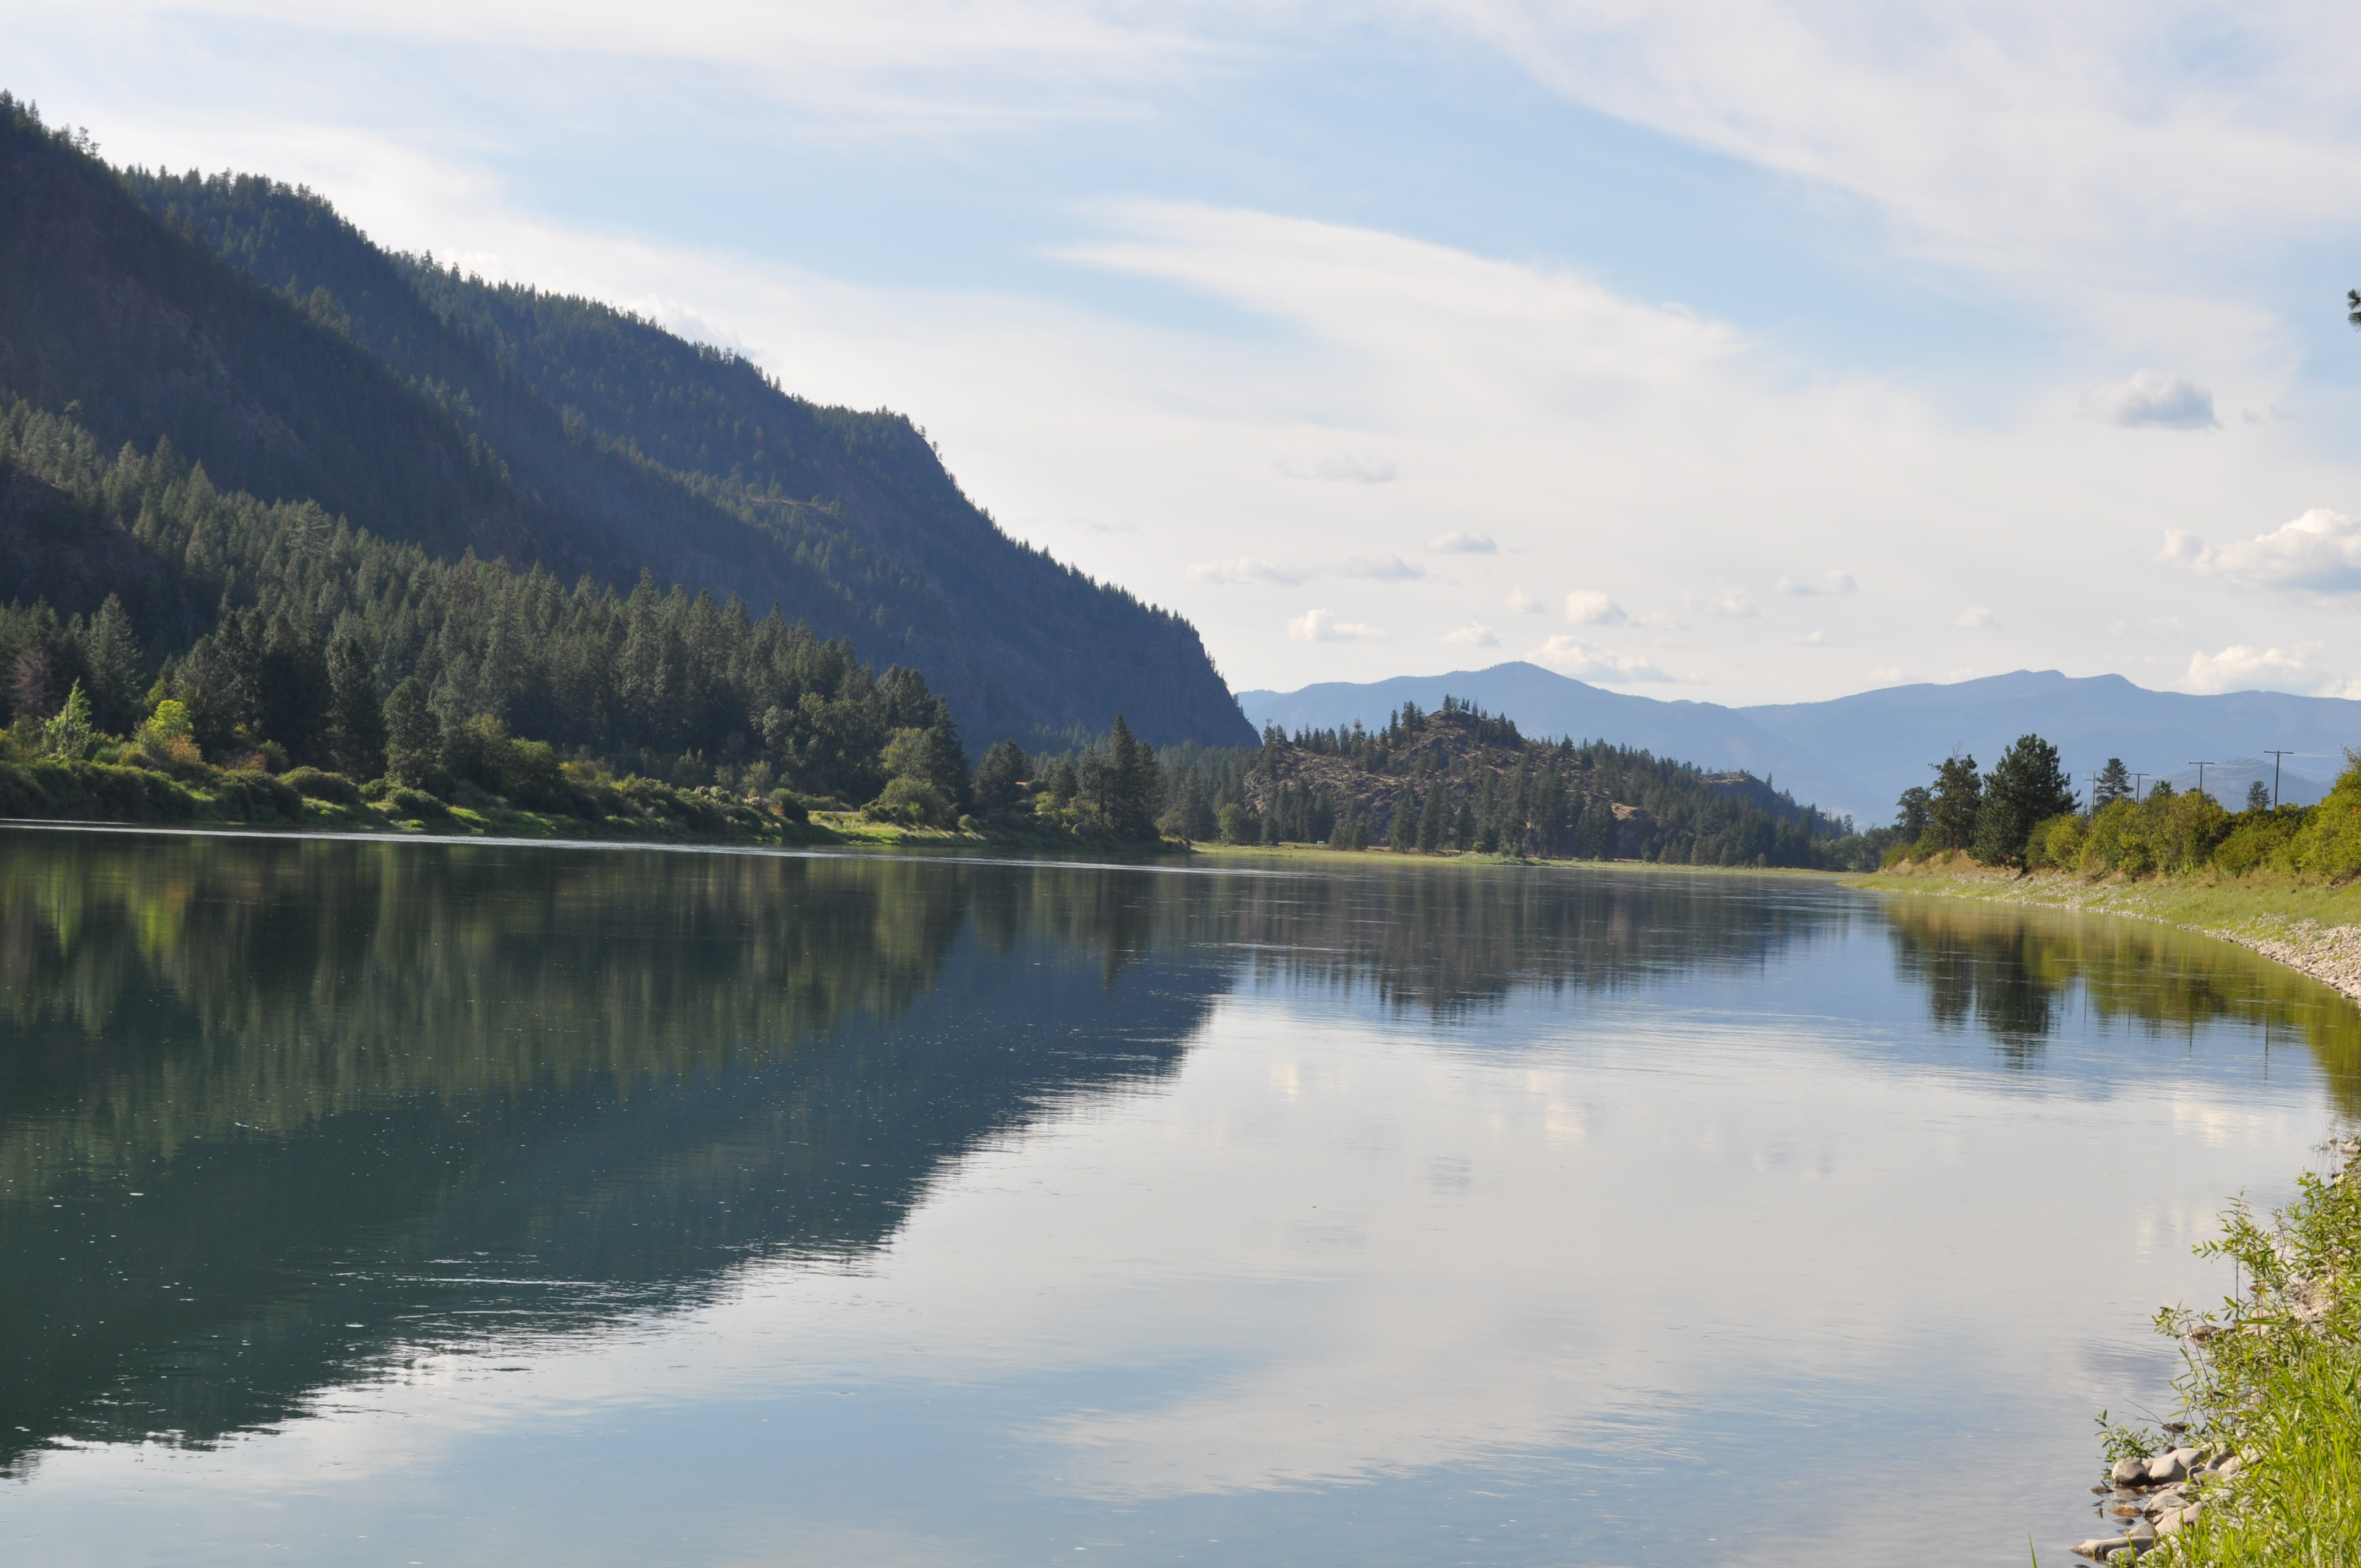 Terreno por un Venta en Nhn River Rd , Paradise, MT 59856 Nhn River Rd Paradise, Montana, 59856 Estados Unidos